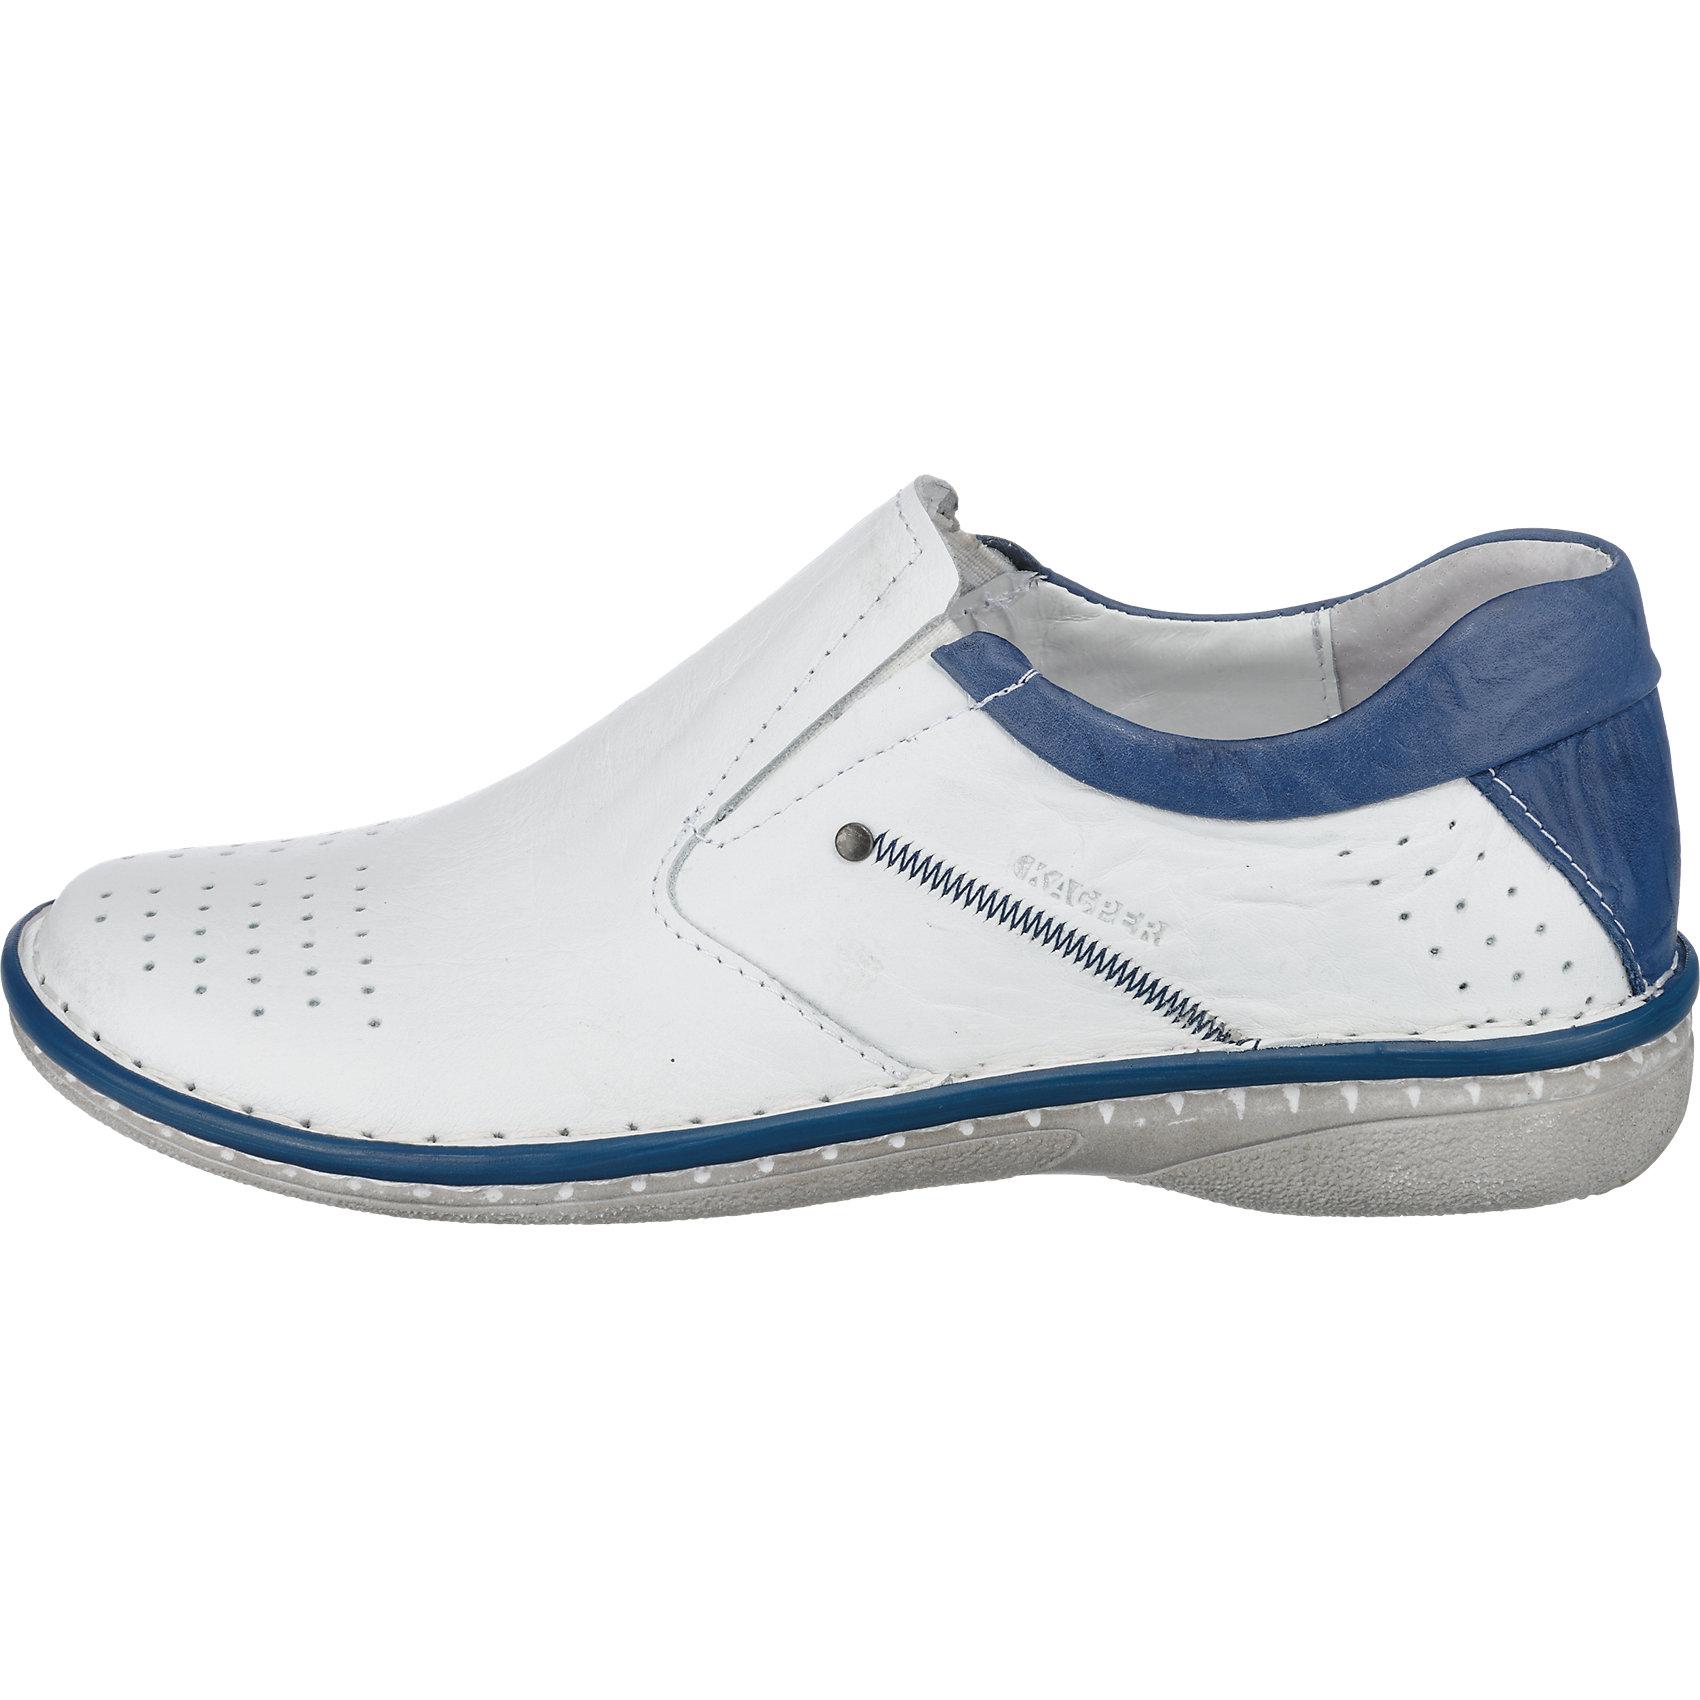 Neu Kacper Slipper 5772429 für Damen blau weiß